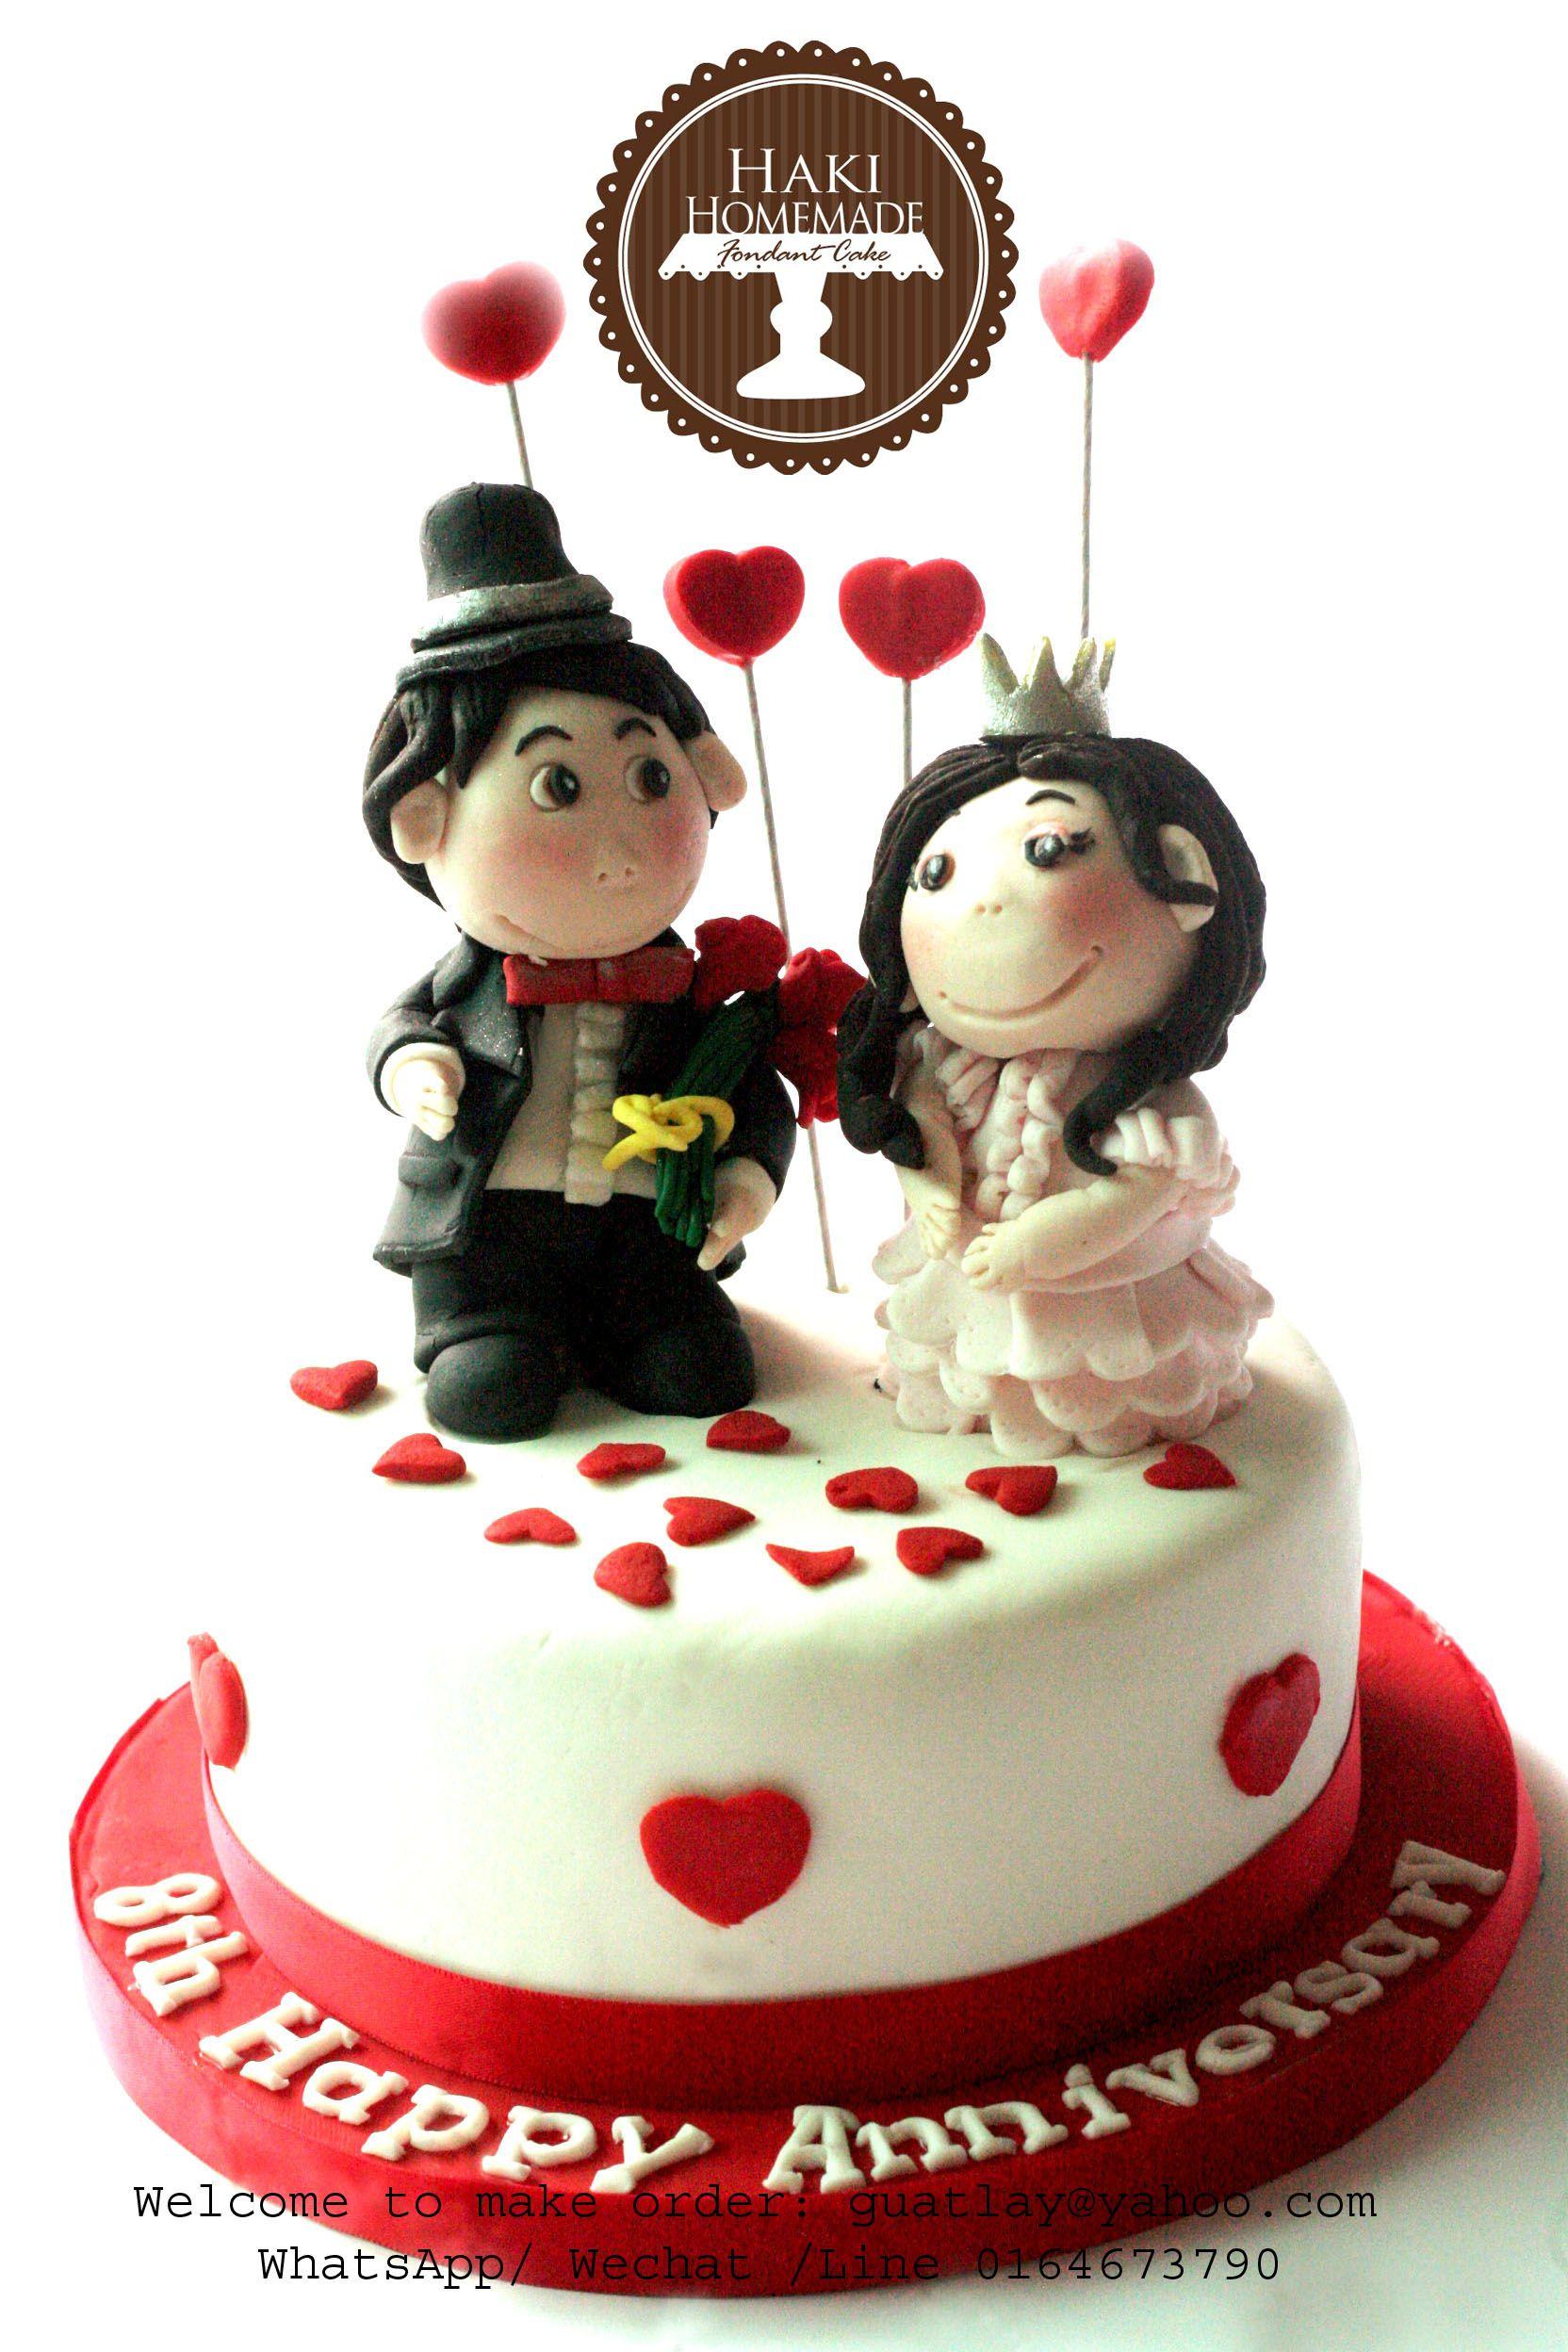 Homemade reception decorations cake ideas and designs - Happy Anniversary Fondant Cake